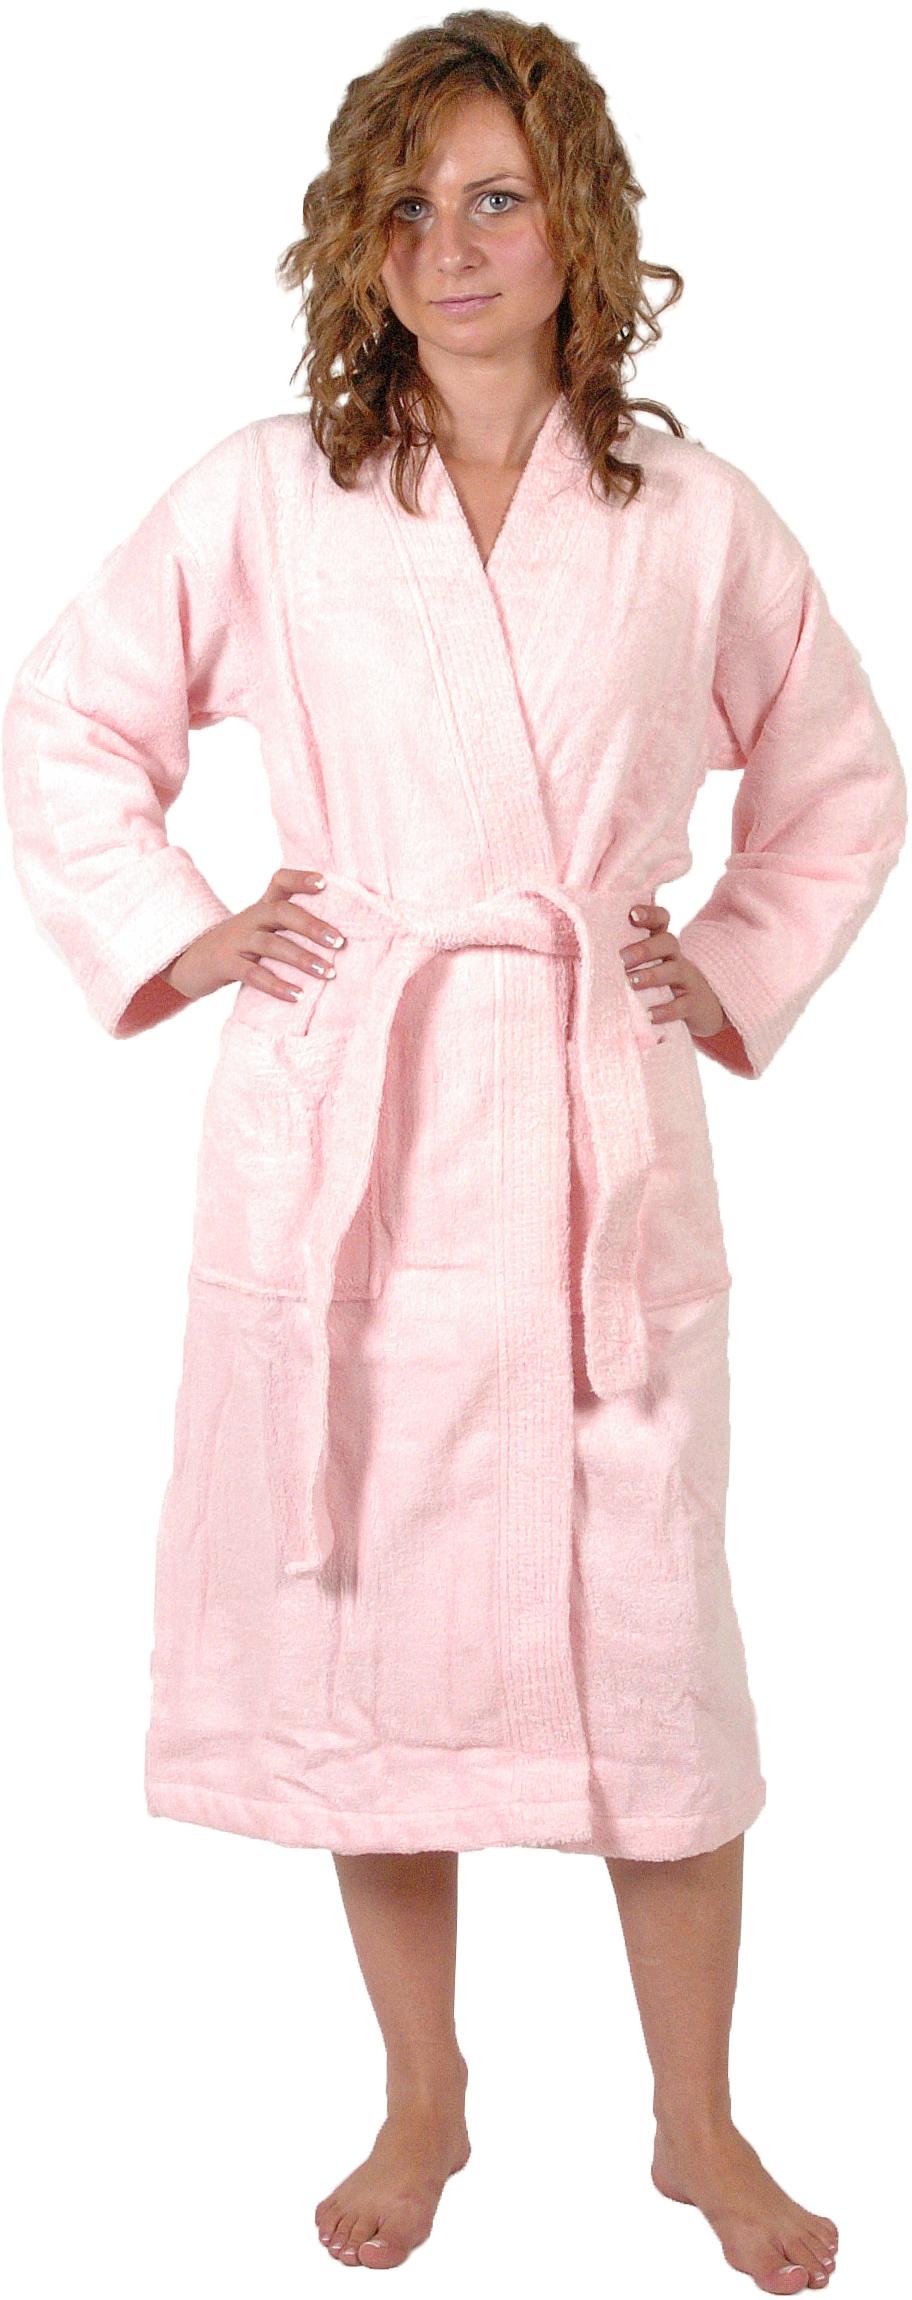 Peignoir col kimono en Coton couleur Rose Taille M (Rose)